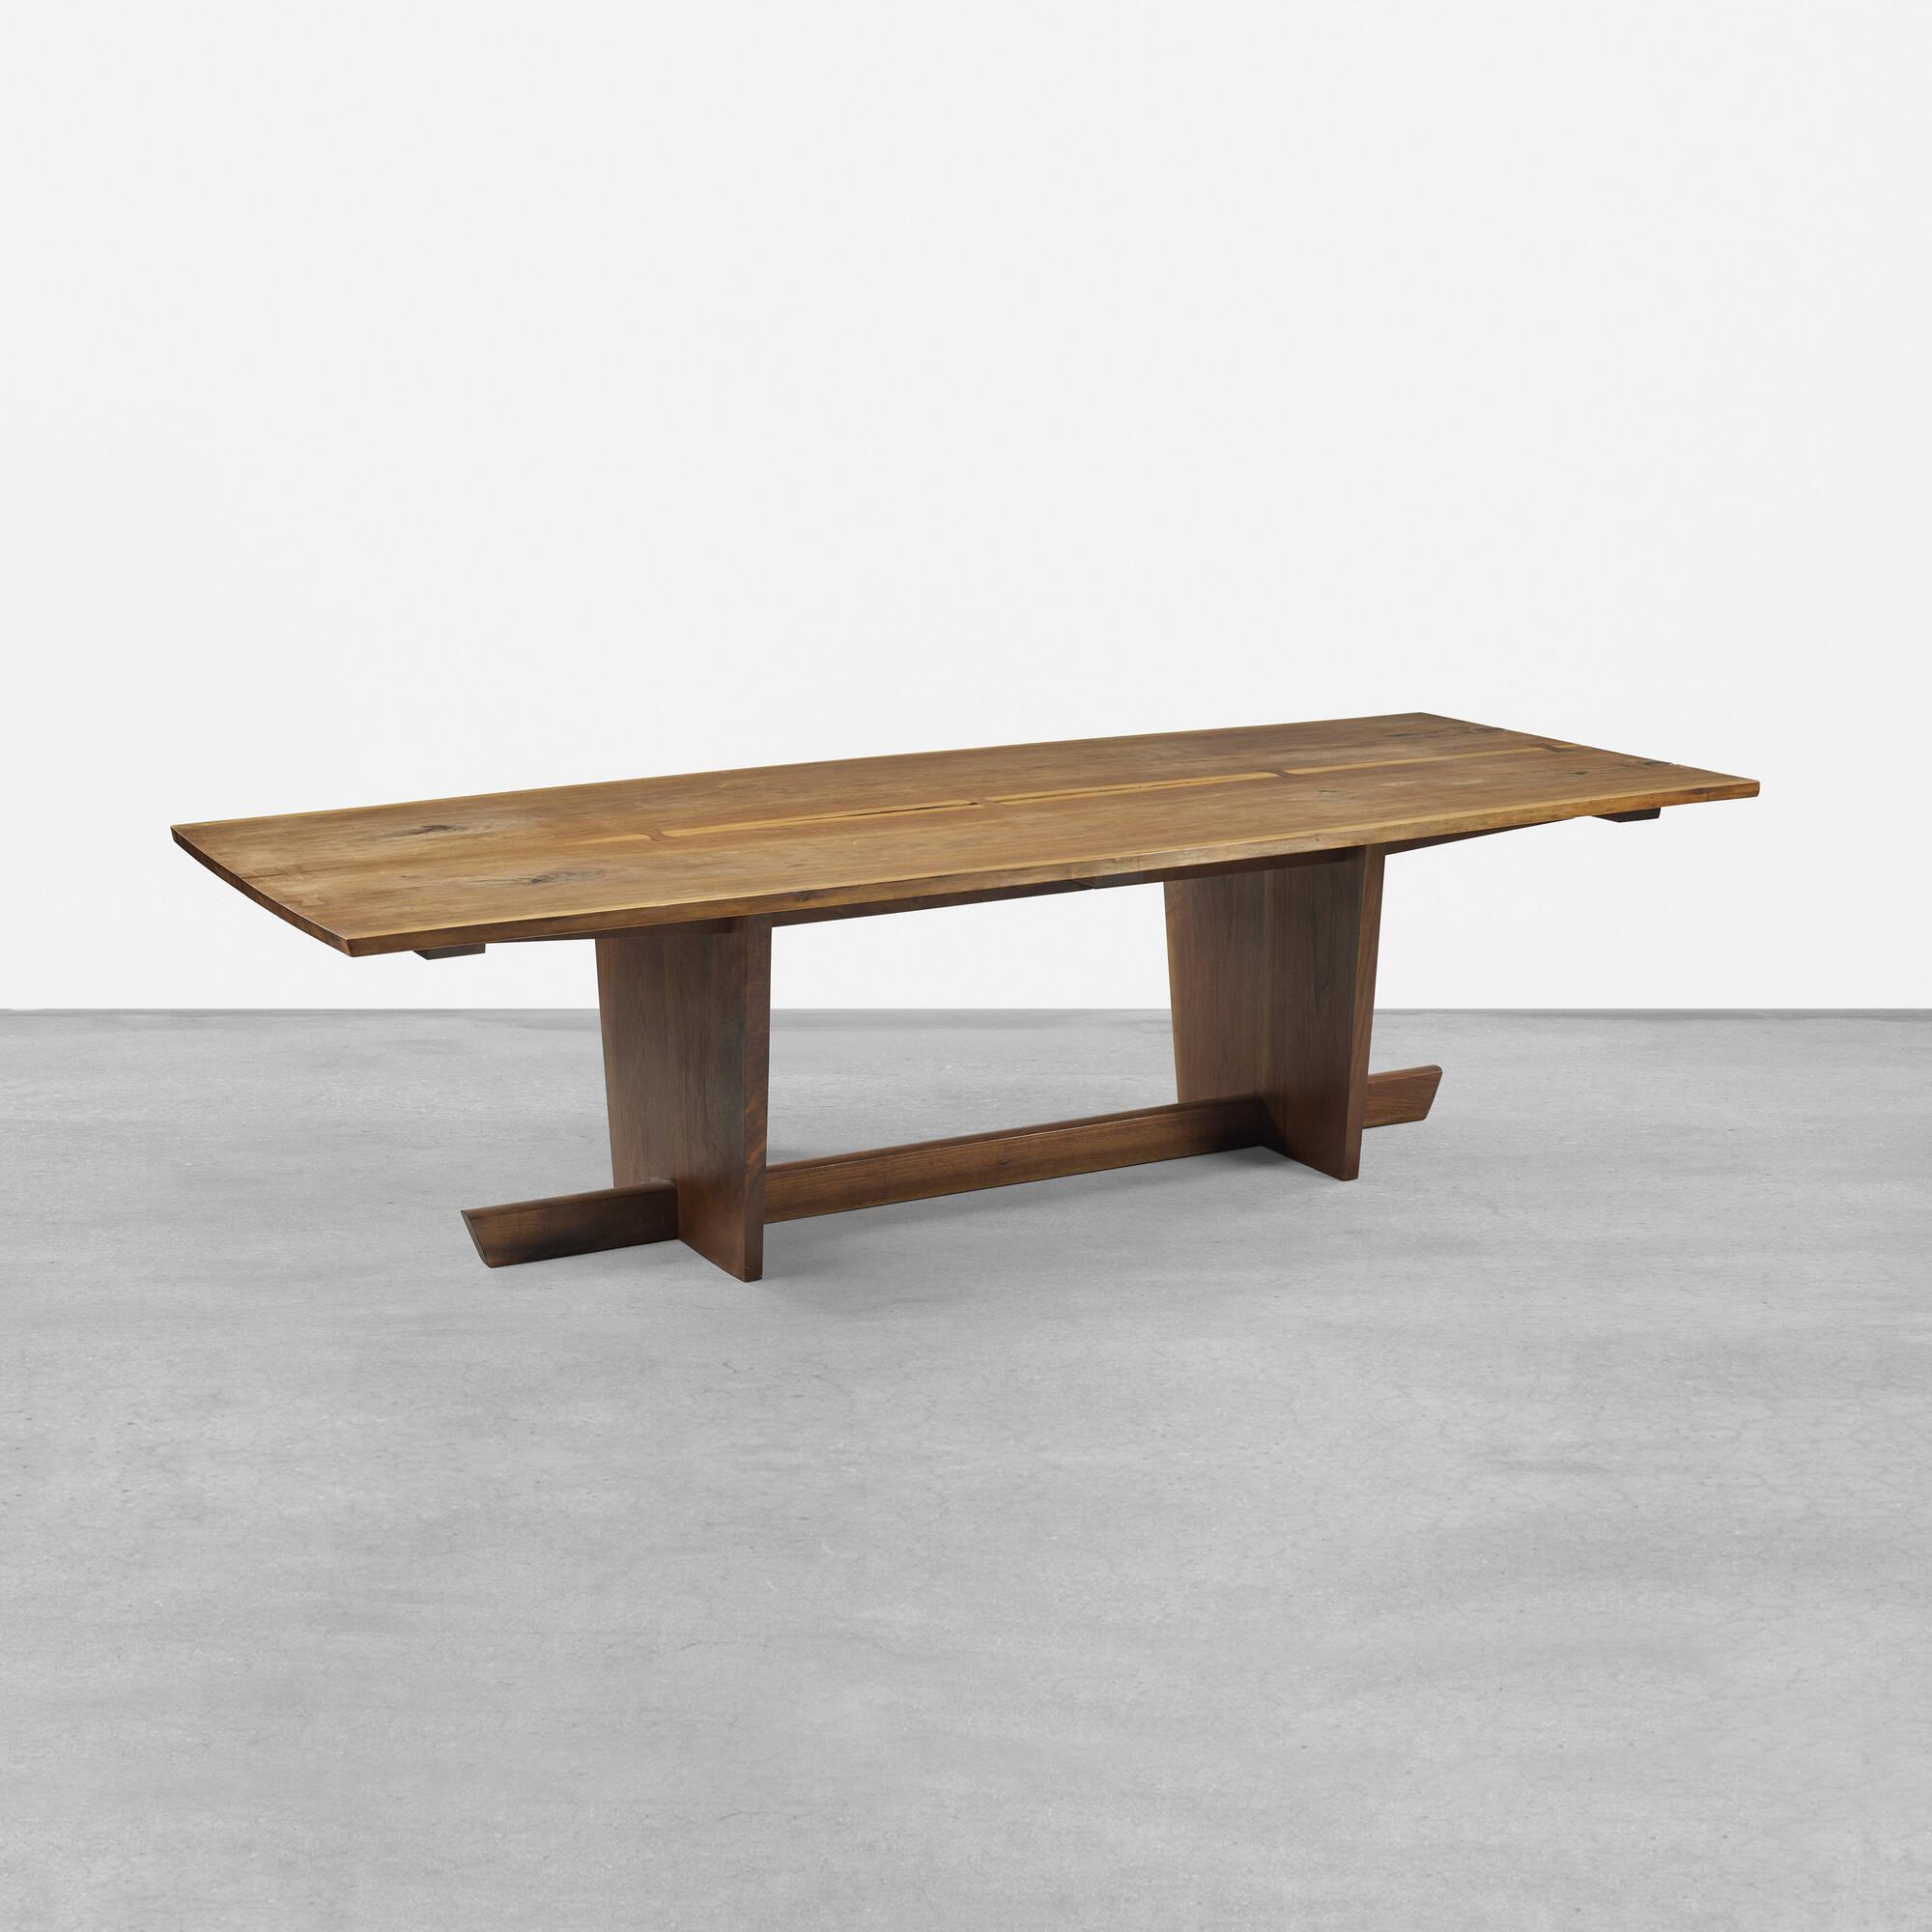 169 mira nakashima minguren ii dining table for Dining table design 2015